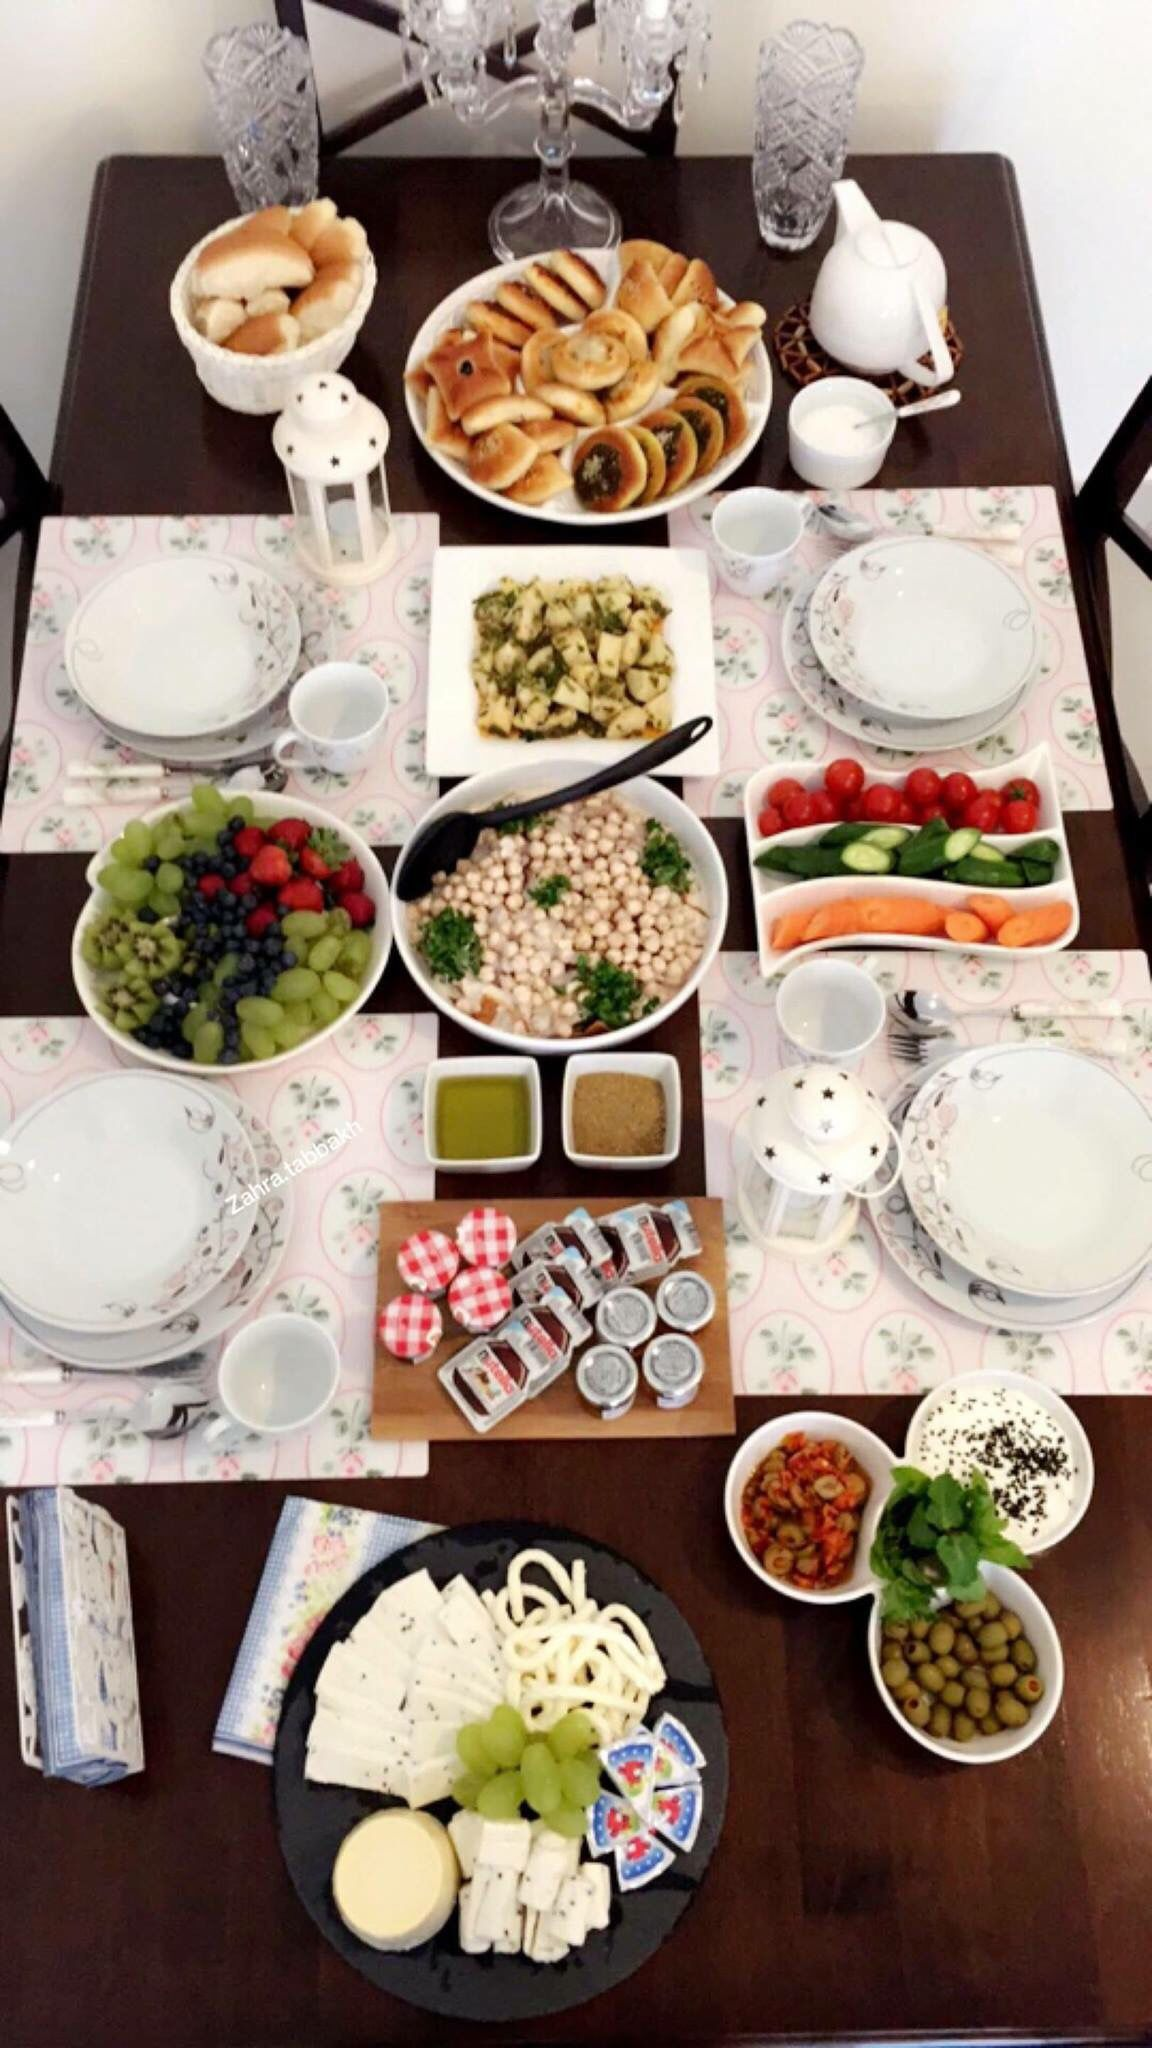 Homedecor ترتيب افكار ترتيب ترتيب طعام ديكور طاولات سفرة طعام أكلات طبخات تزيين طاولات تزيين Tablesettings Food Food Photography Table Setting Decor